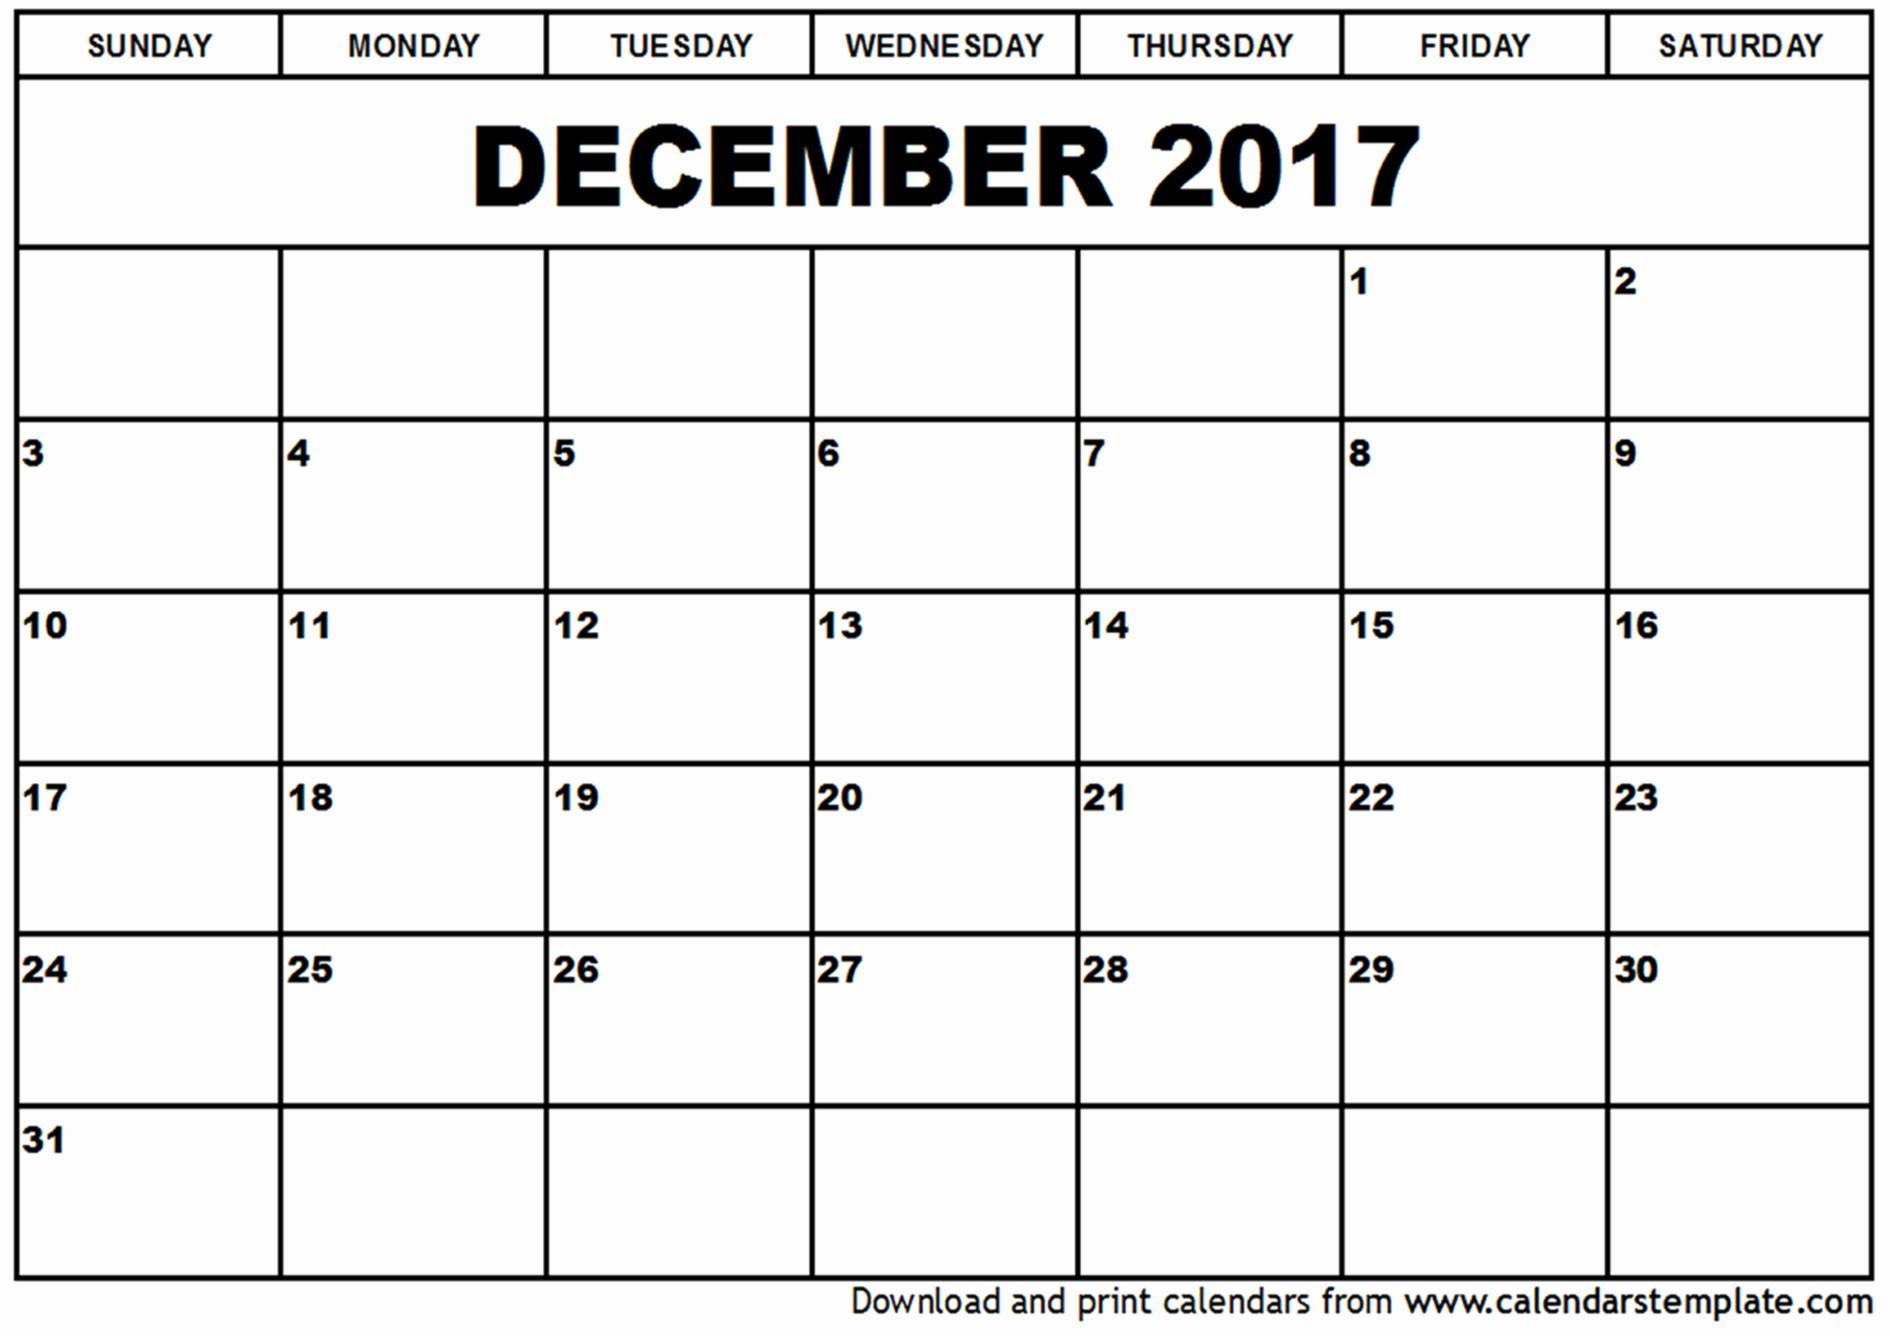 Calendario Imprimir Vertex Recientes December 2017 Word Template Best December 2017 Calendar Word Of Calendario Imprimir Vertex Más Recientes Printable Blank Run Charts Architecture Modern Idea •